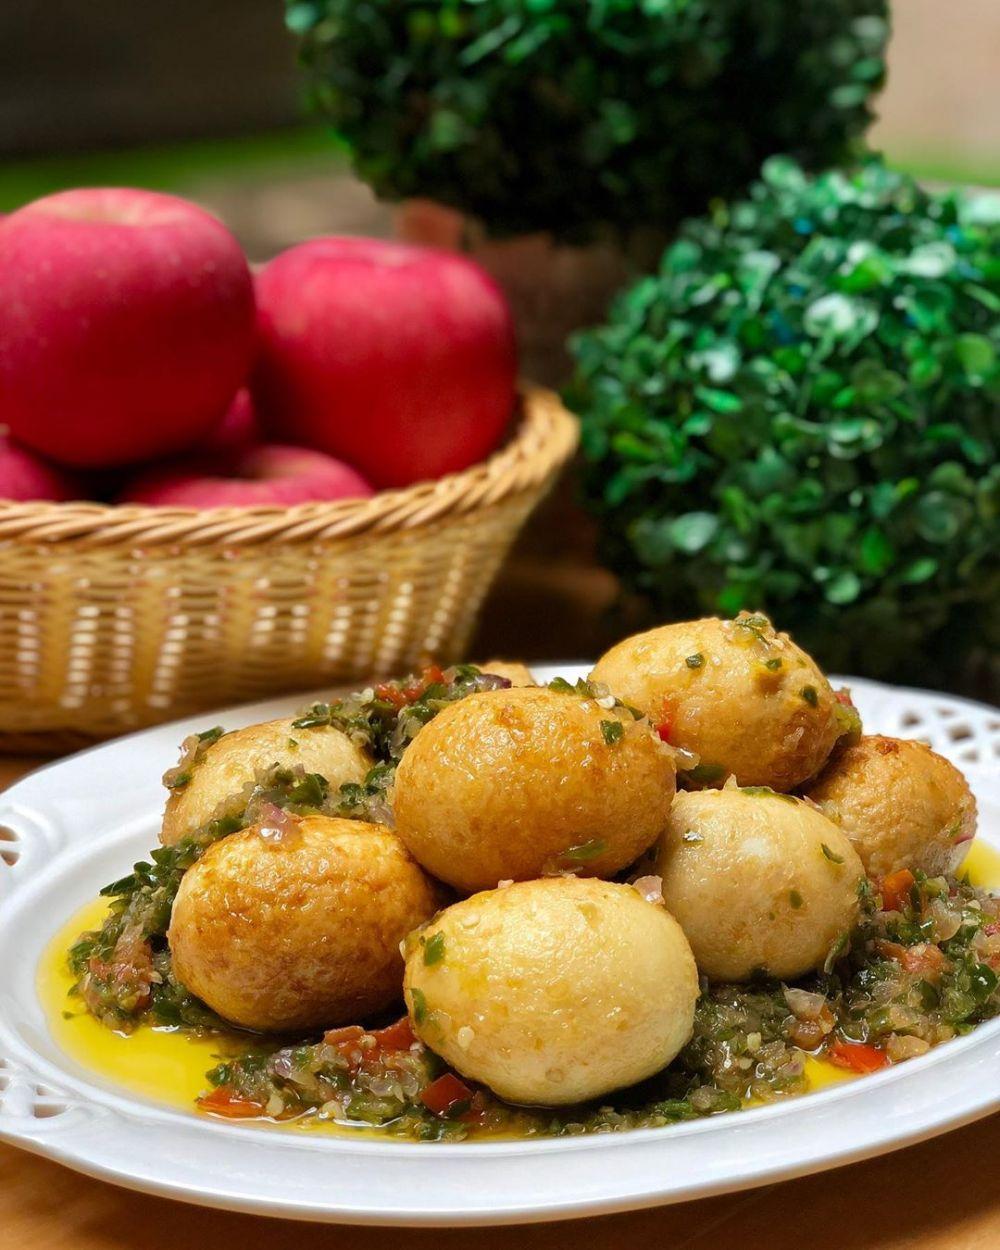 Resep masakan ala desa © 2020 brilio.net